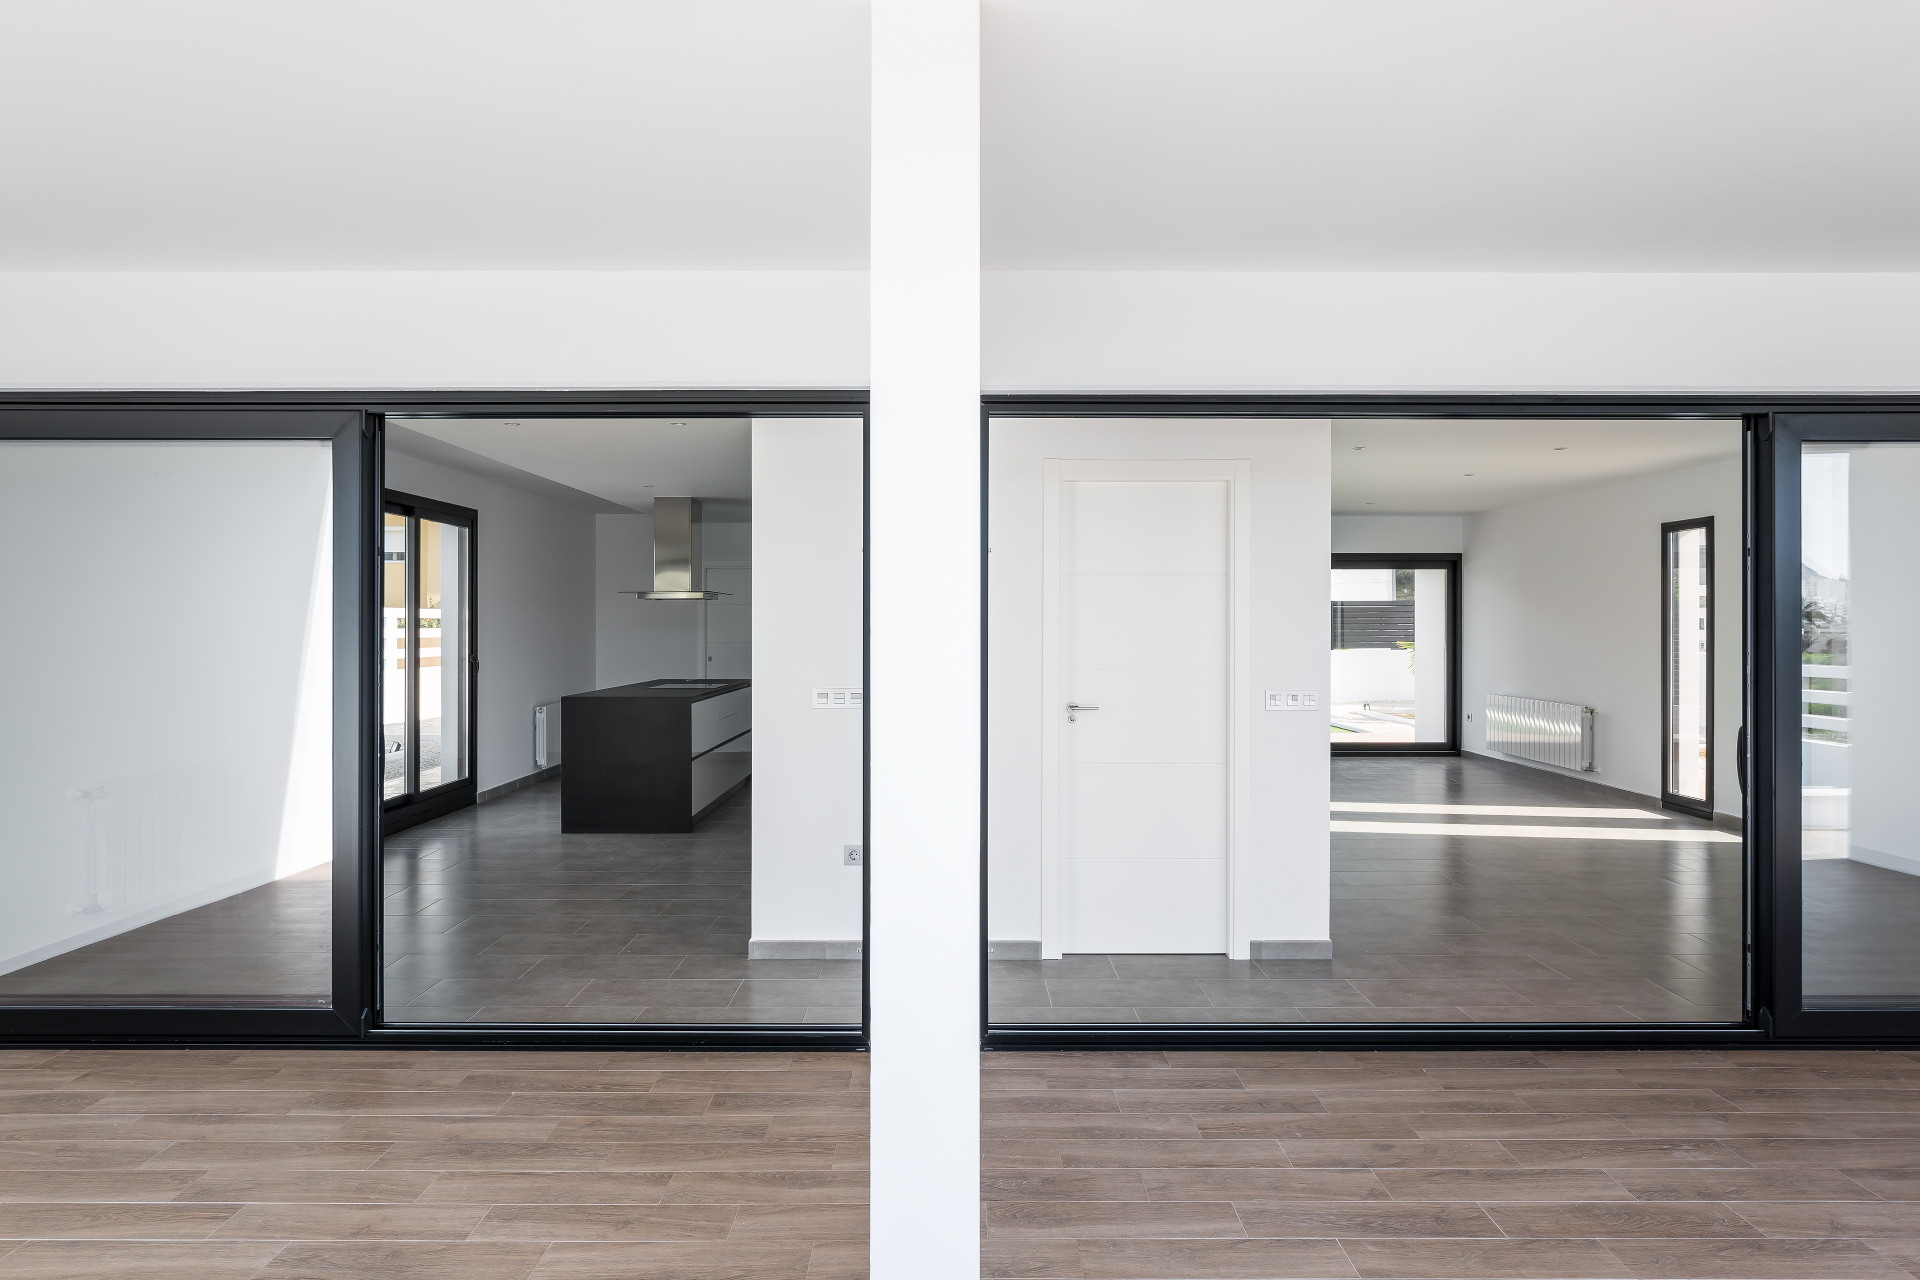 fotografia-arquitectura-valencia-german-cabo-viraje-vivienda-unifamiliar-calpe (26)